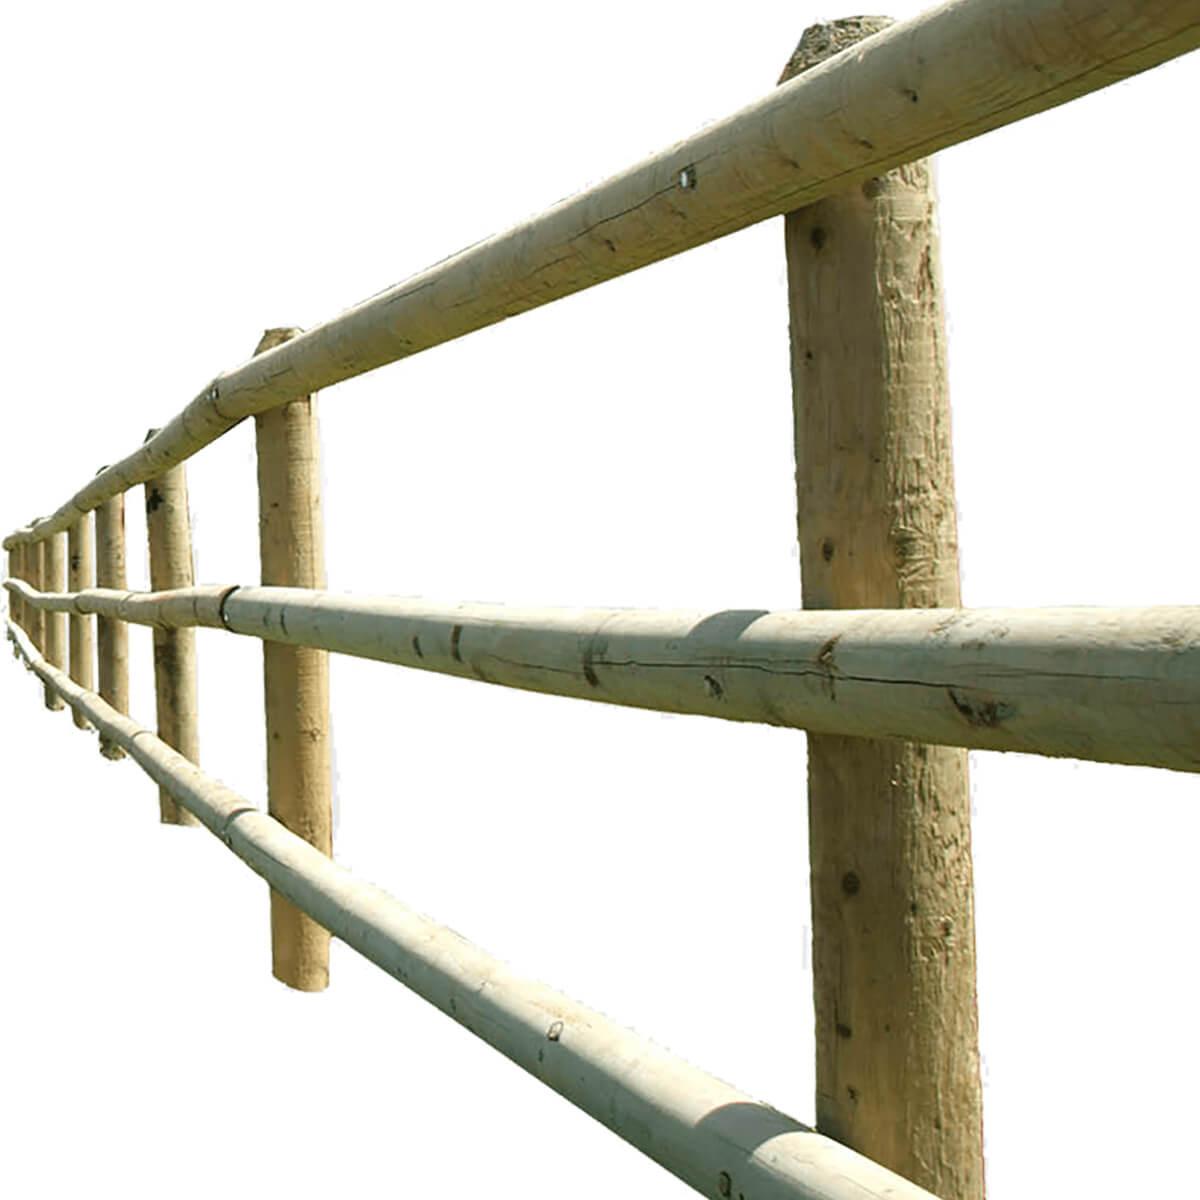 Dowelled Rail - Blunt - 3.25-in x 16-ft